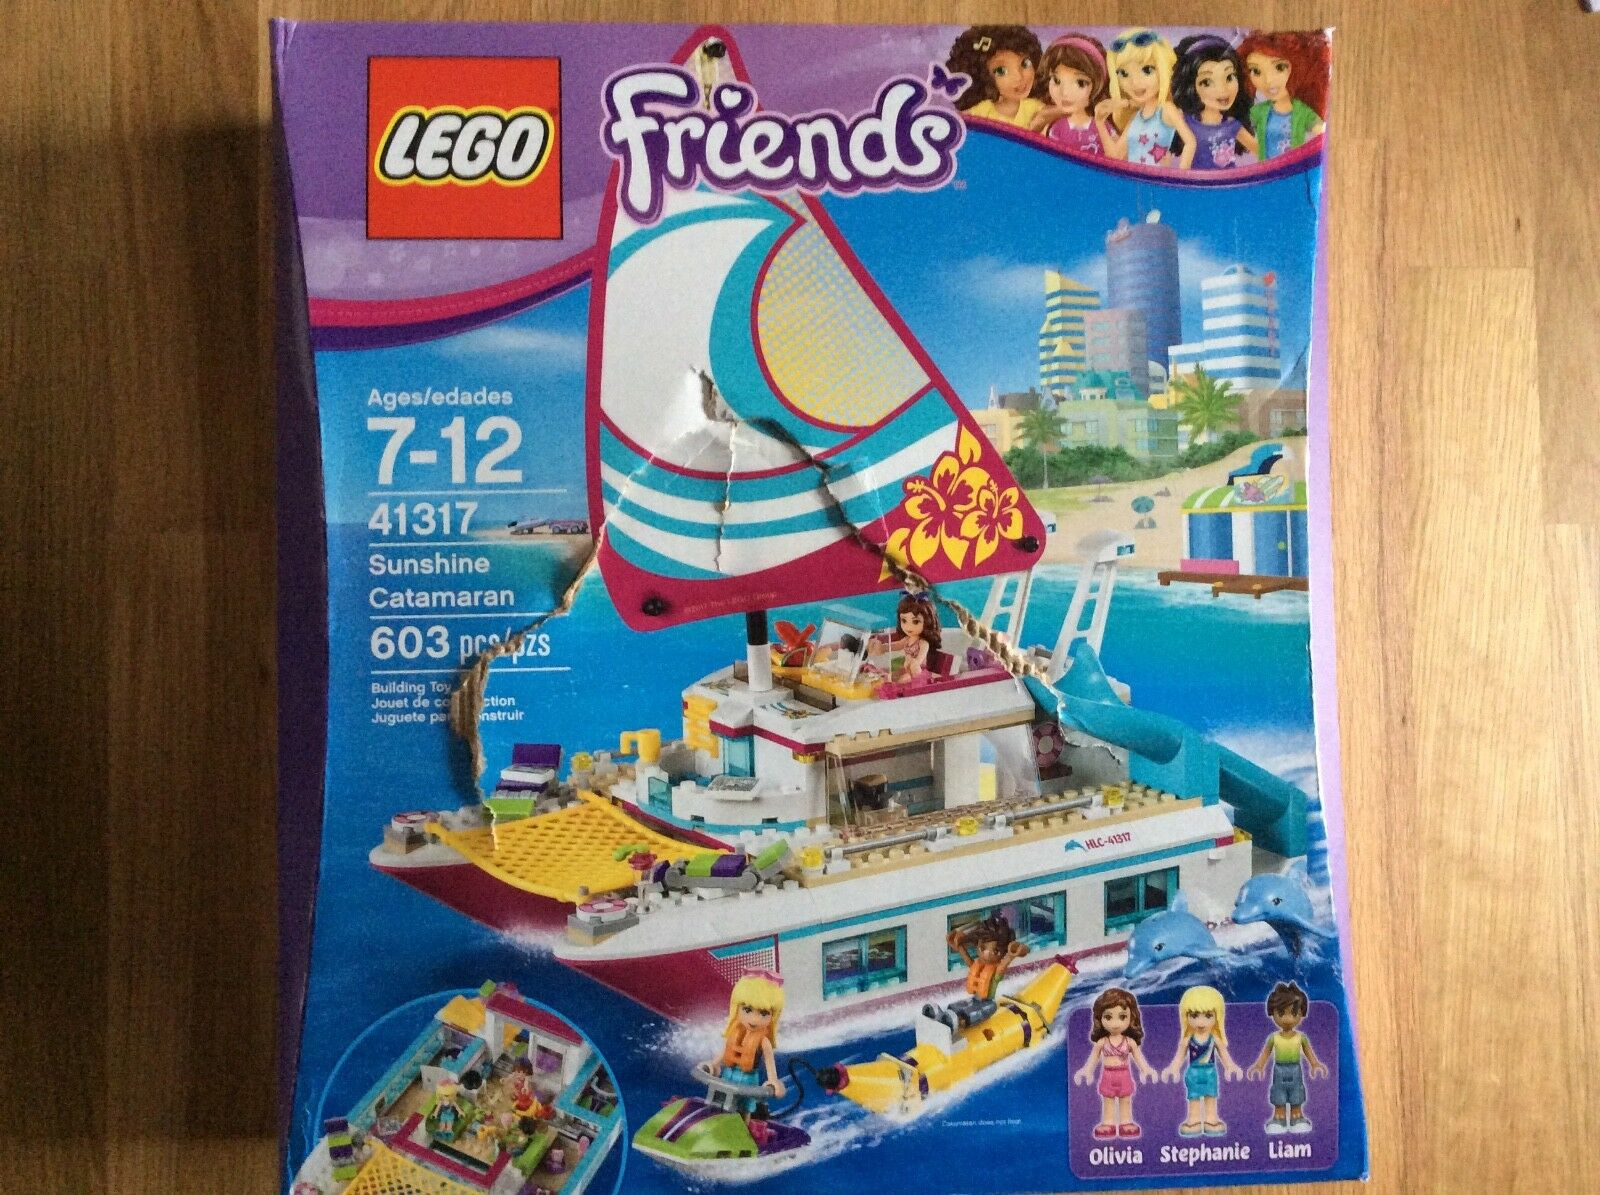 New Lego Friends Sunshine Catamaran Set 41317 in Sealed Damaged Box